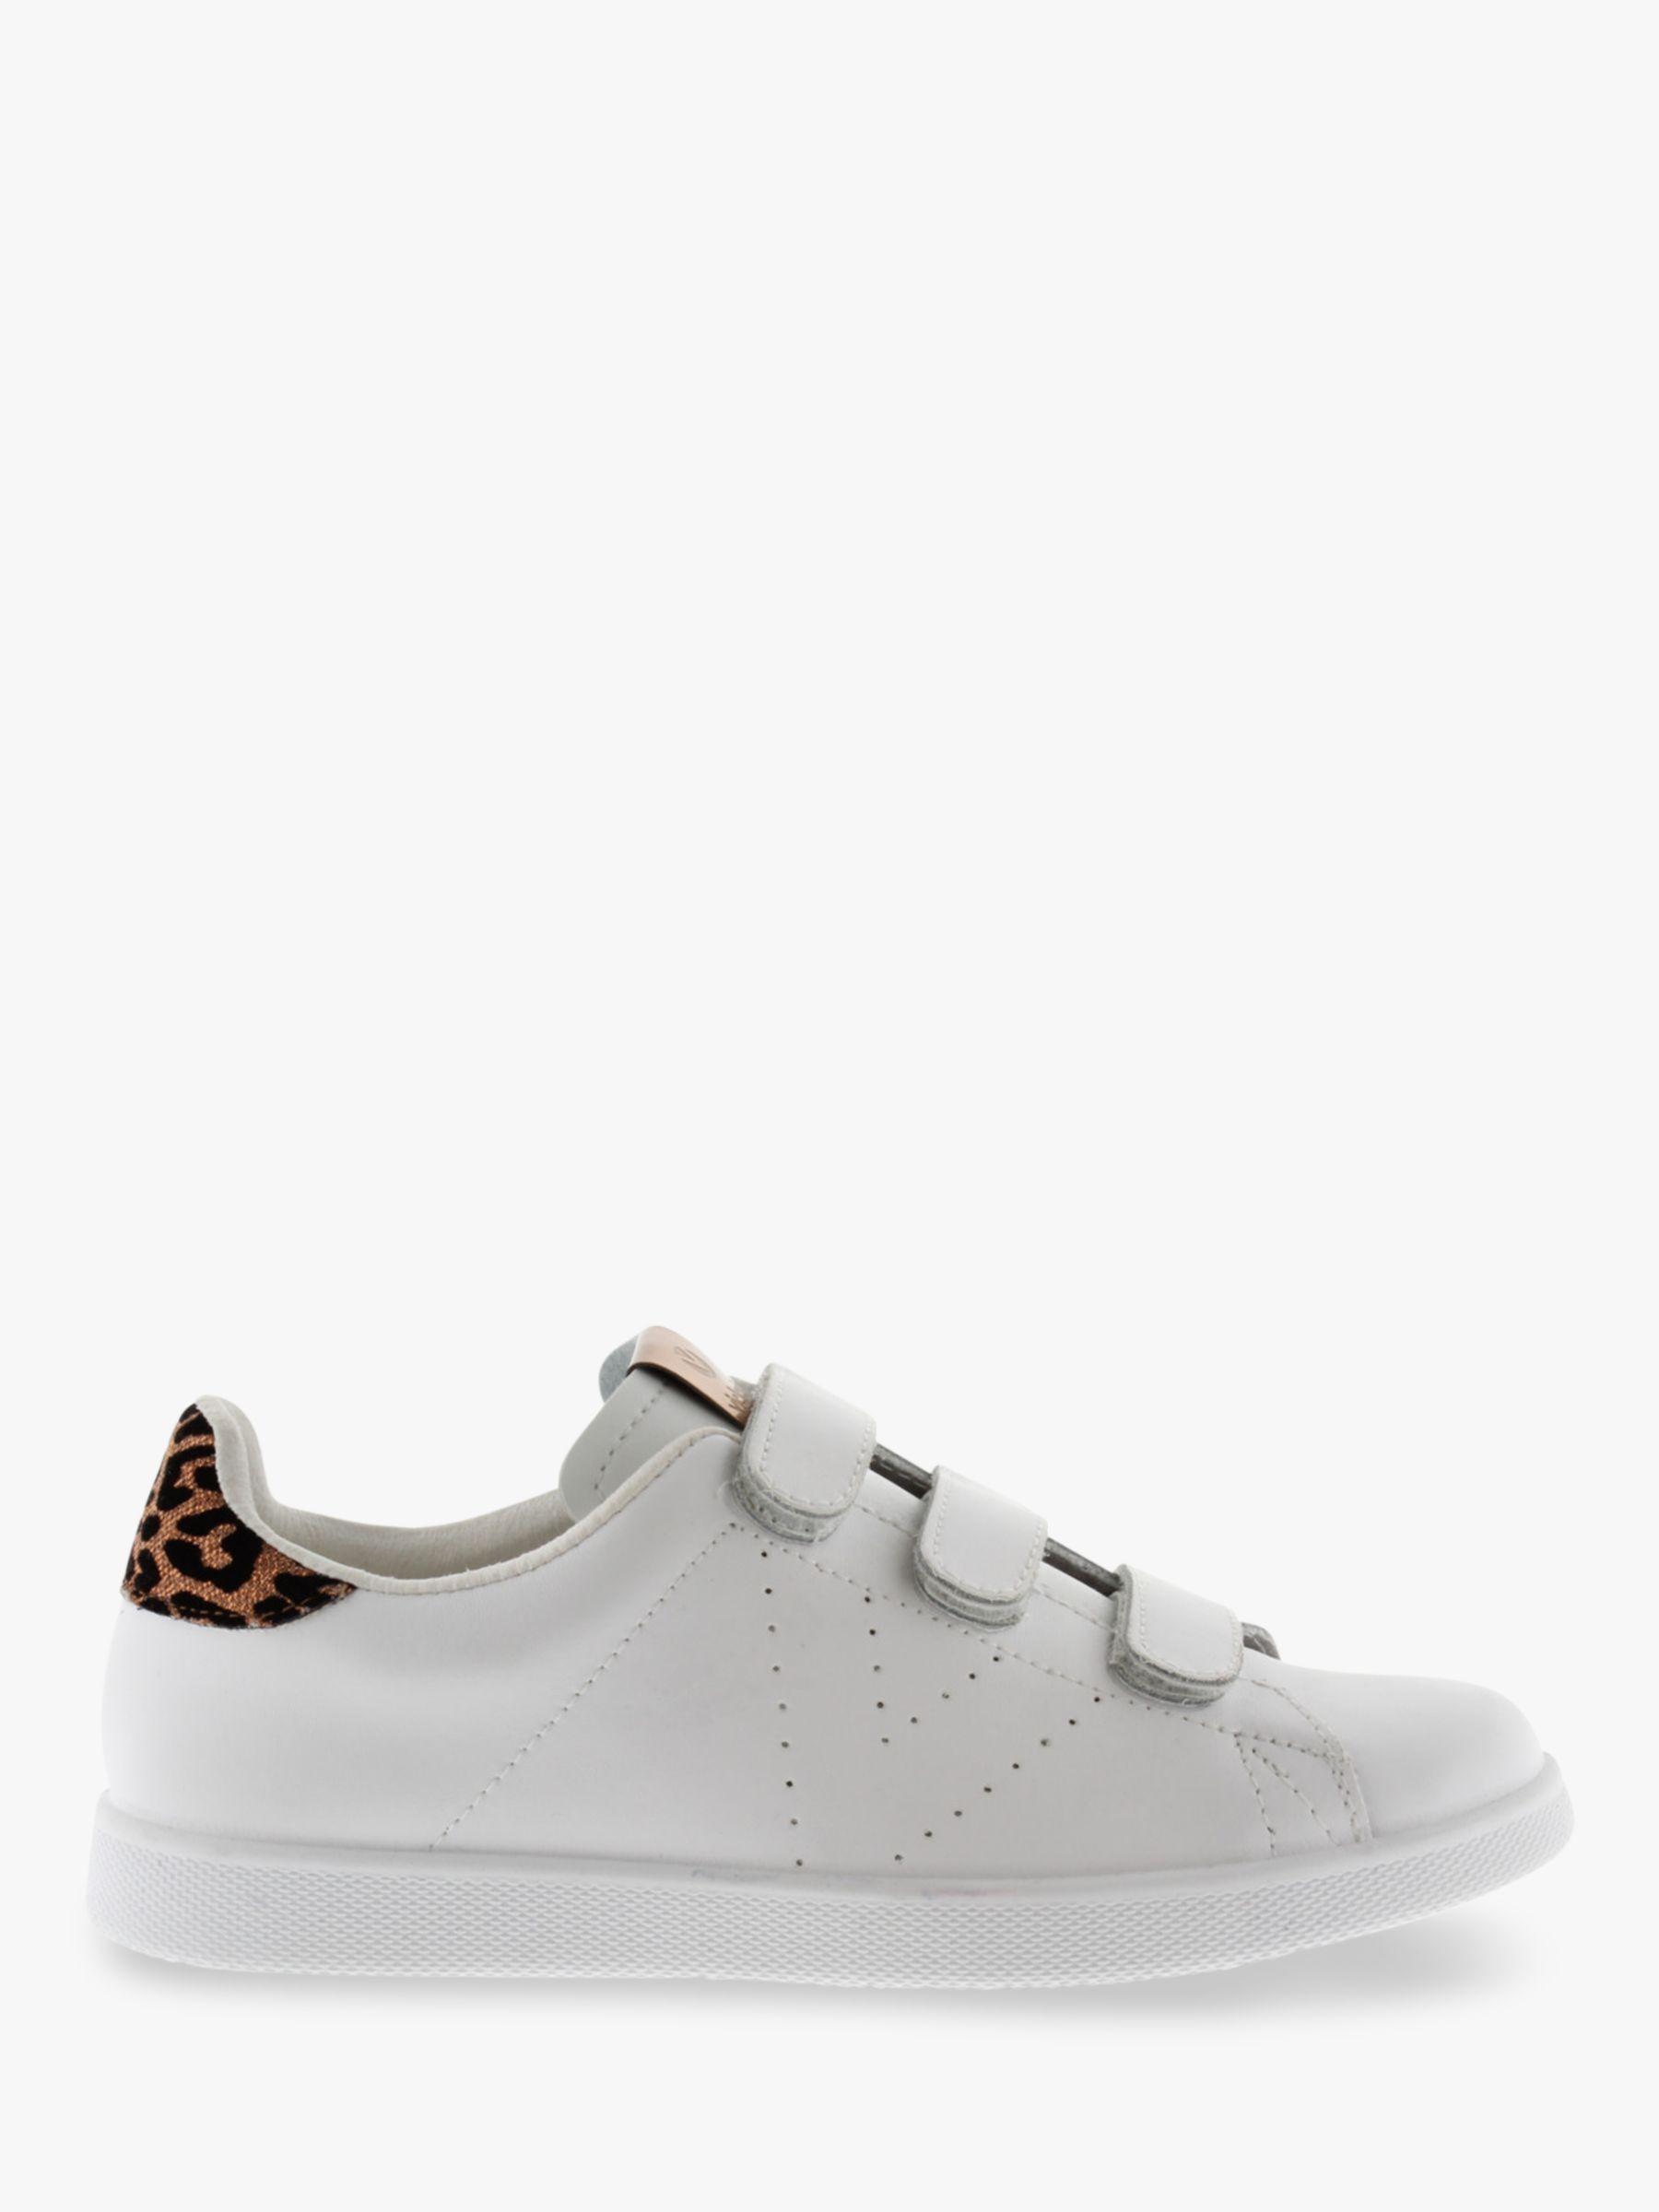 Victoria Shoes Victoria Shoes Tenis Piel Leather Trainers, White/Leopard Print